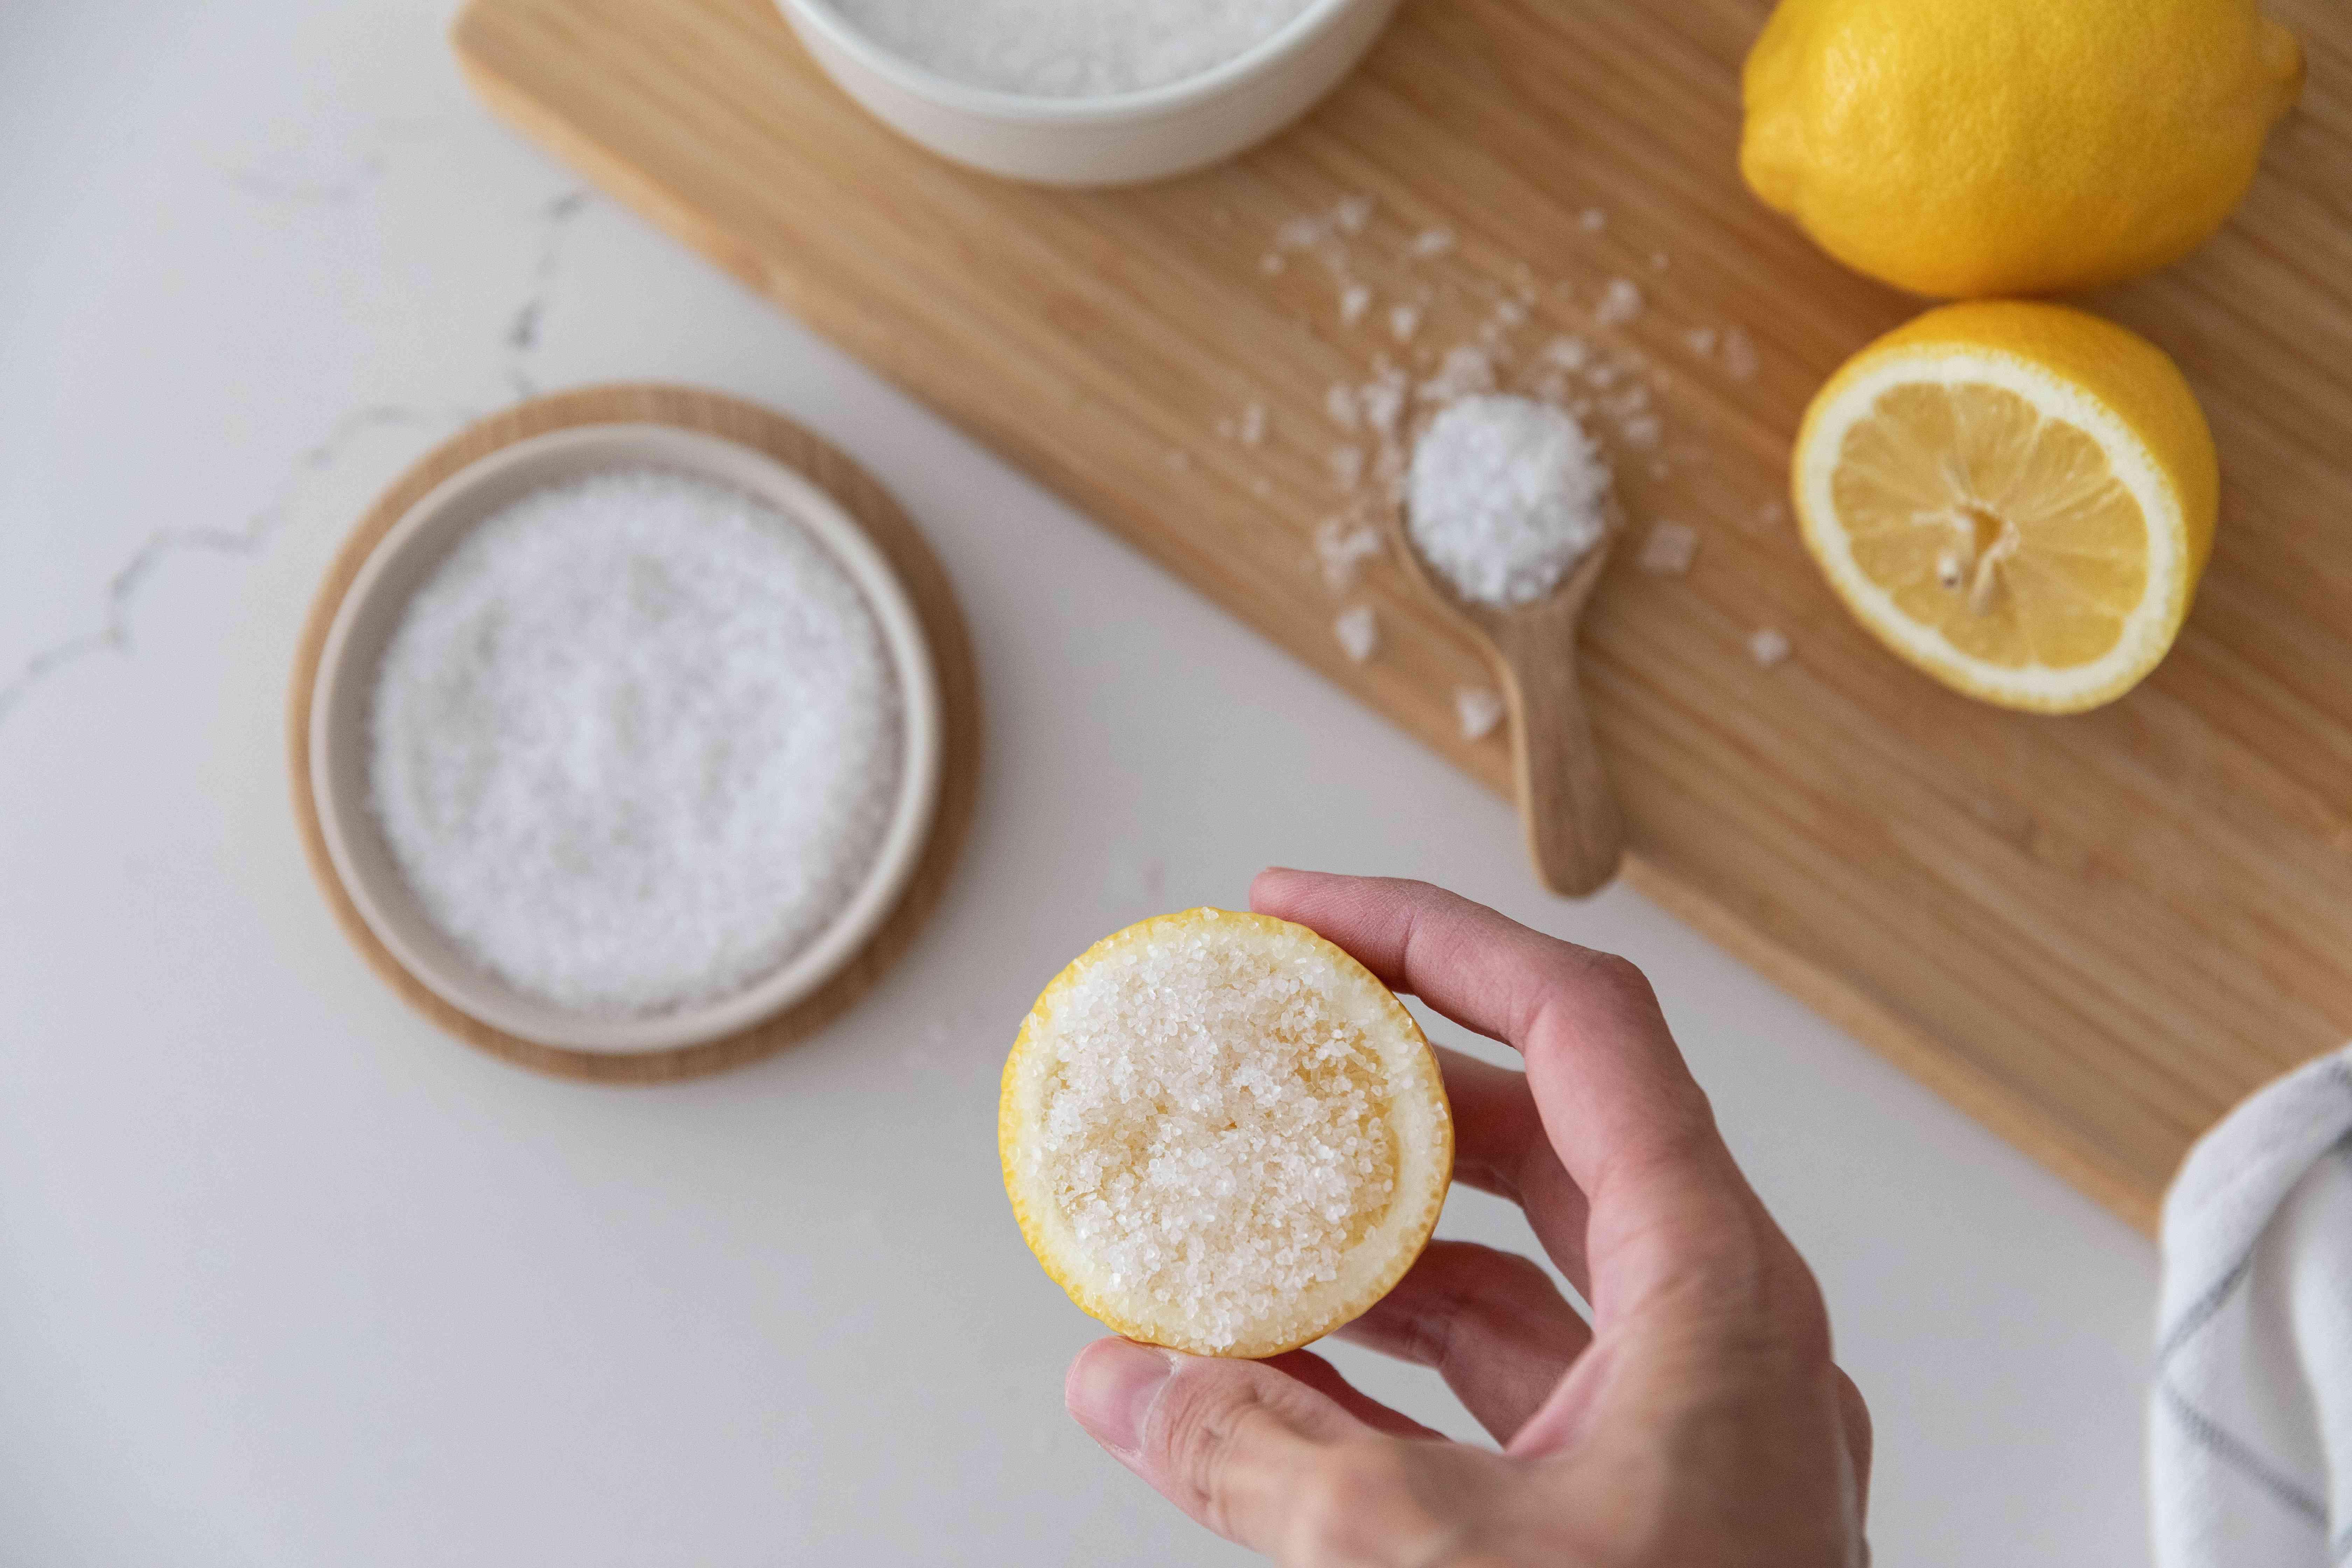 Salt rubbed on lemon half above bowl of salt and cut lemons